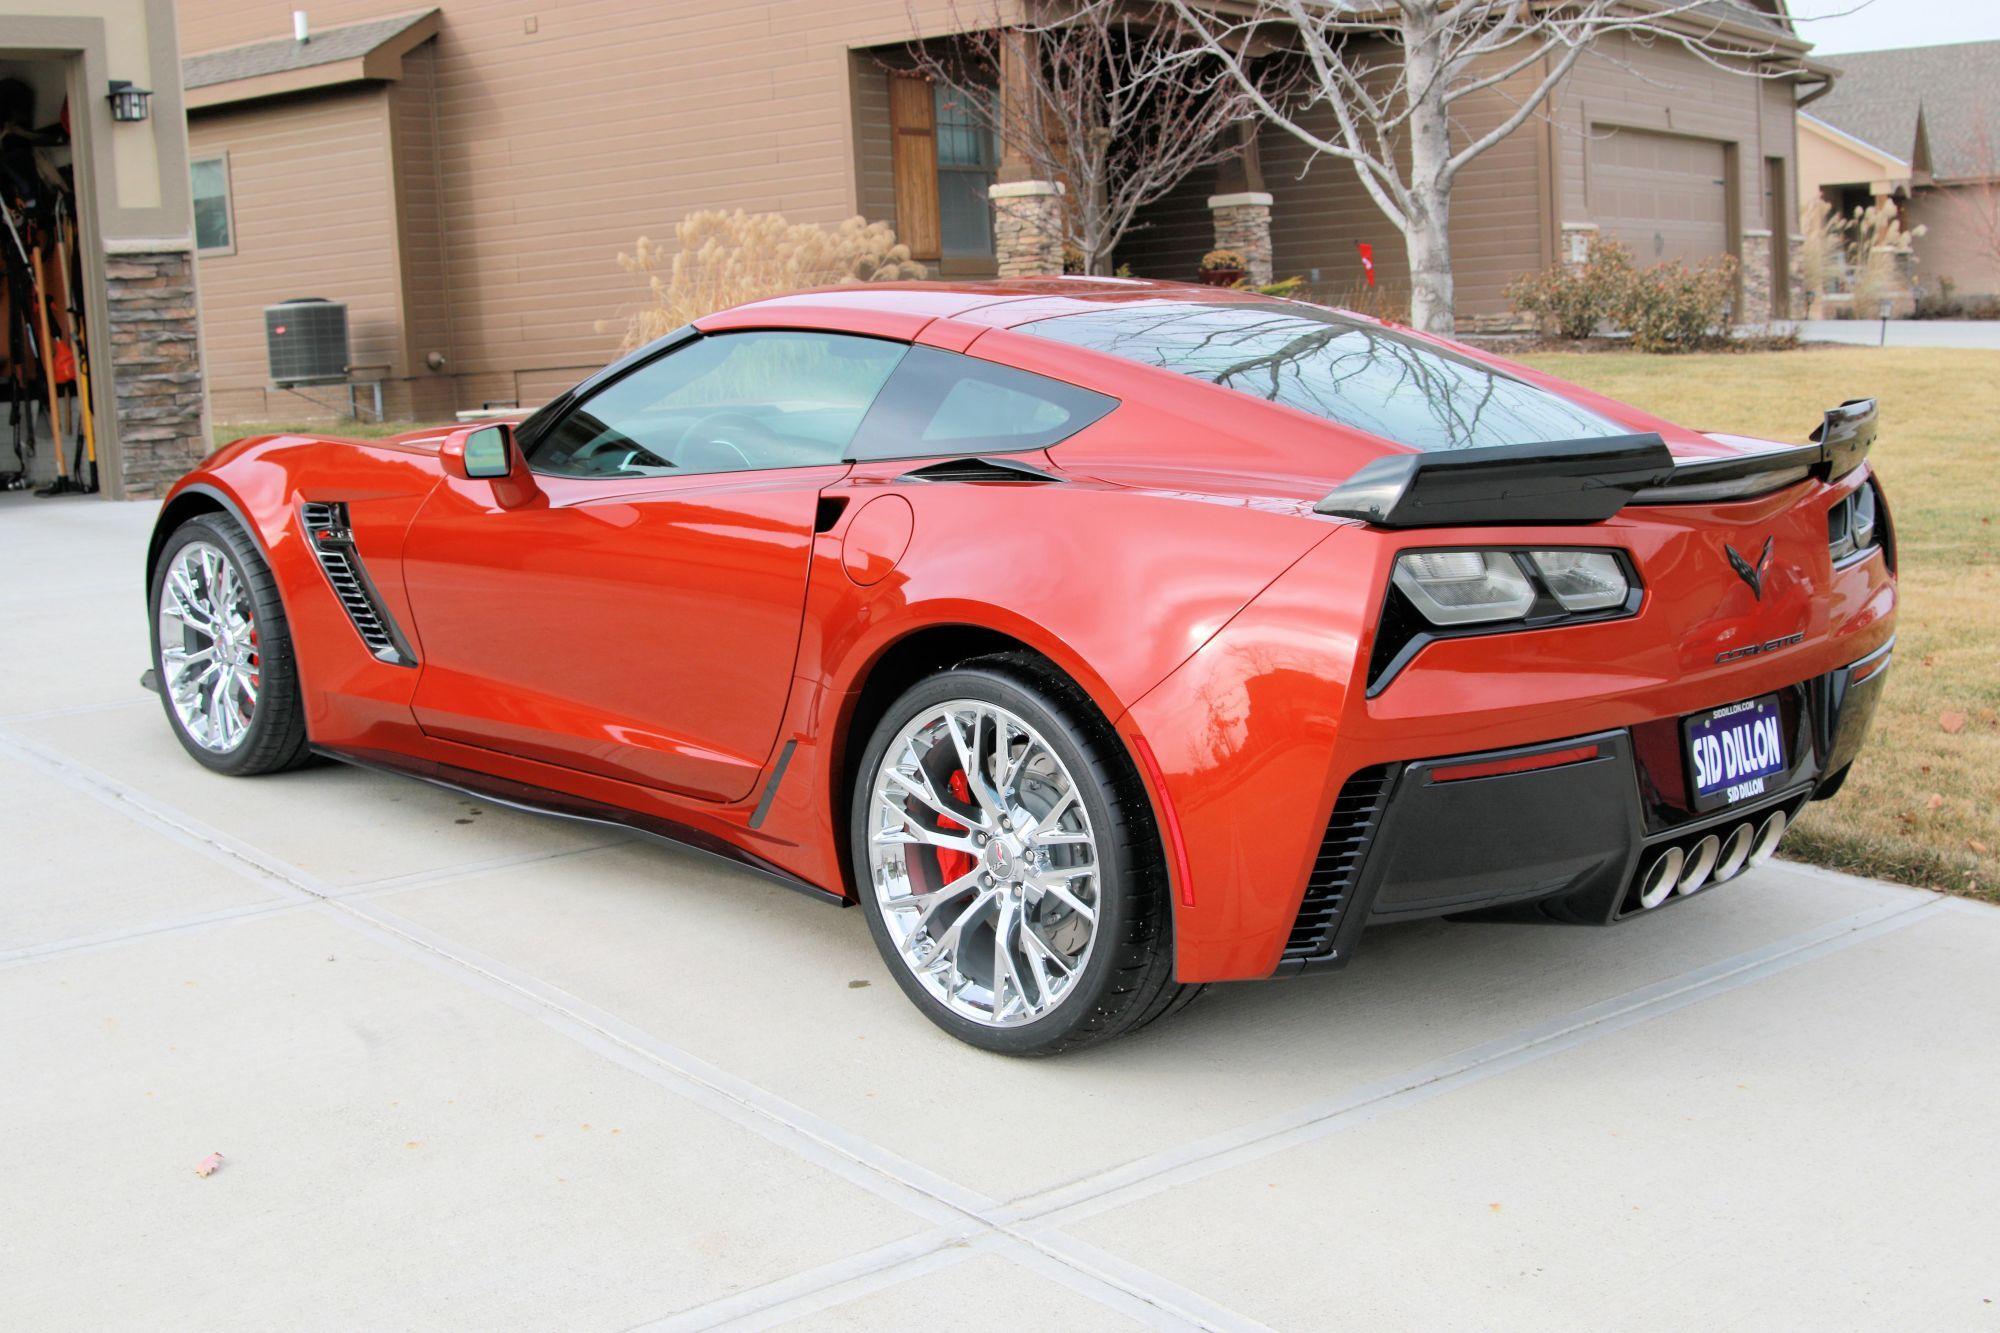 2015 Corvette Z06 Daytona Sunrise Orange Metallic Corvette Corvette Corvette Wheels Chevrolet Corvette Stingray